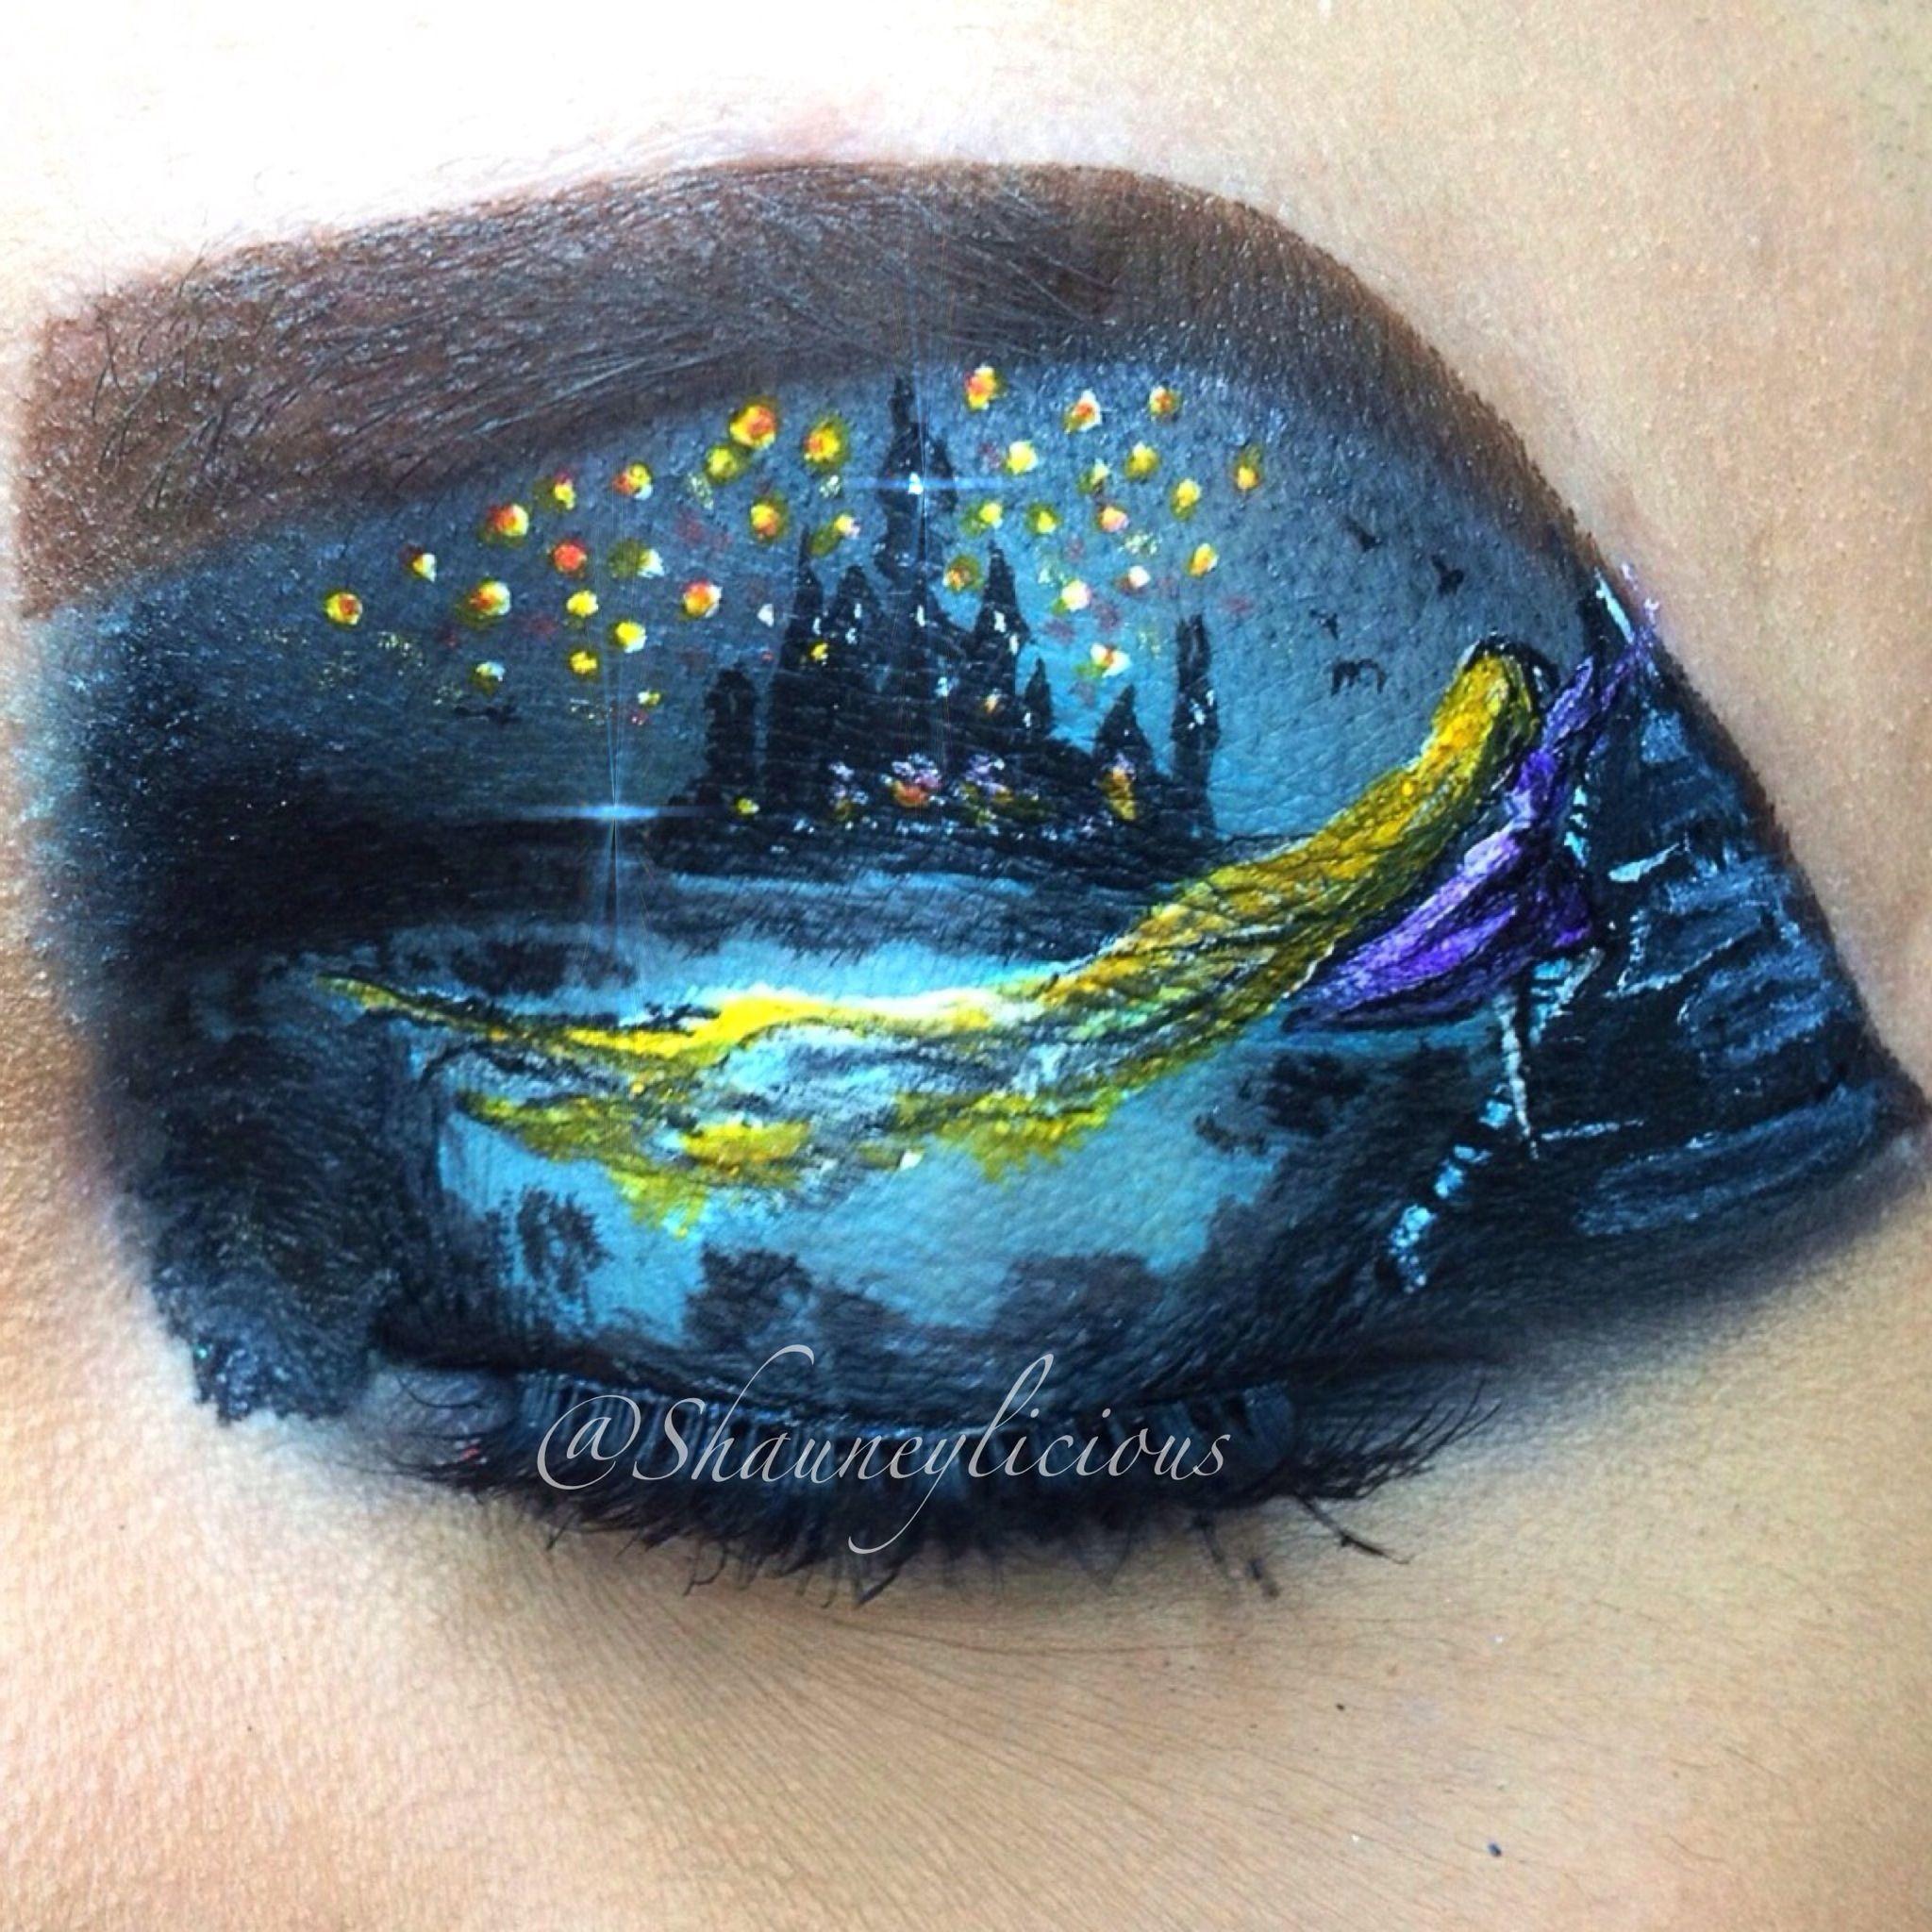 Fantasy makeup / makeup #fantasy #makeup #eyeart #art #eyeshadow #rapunzel #tangled #disney